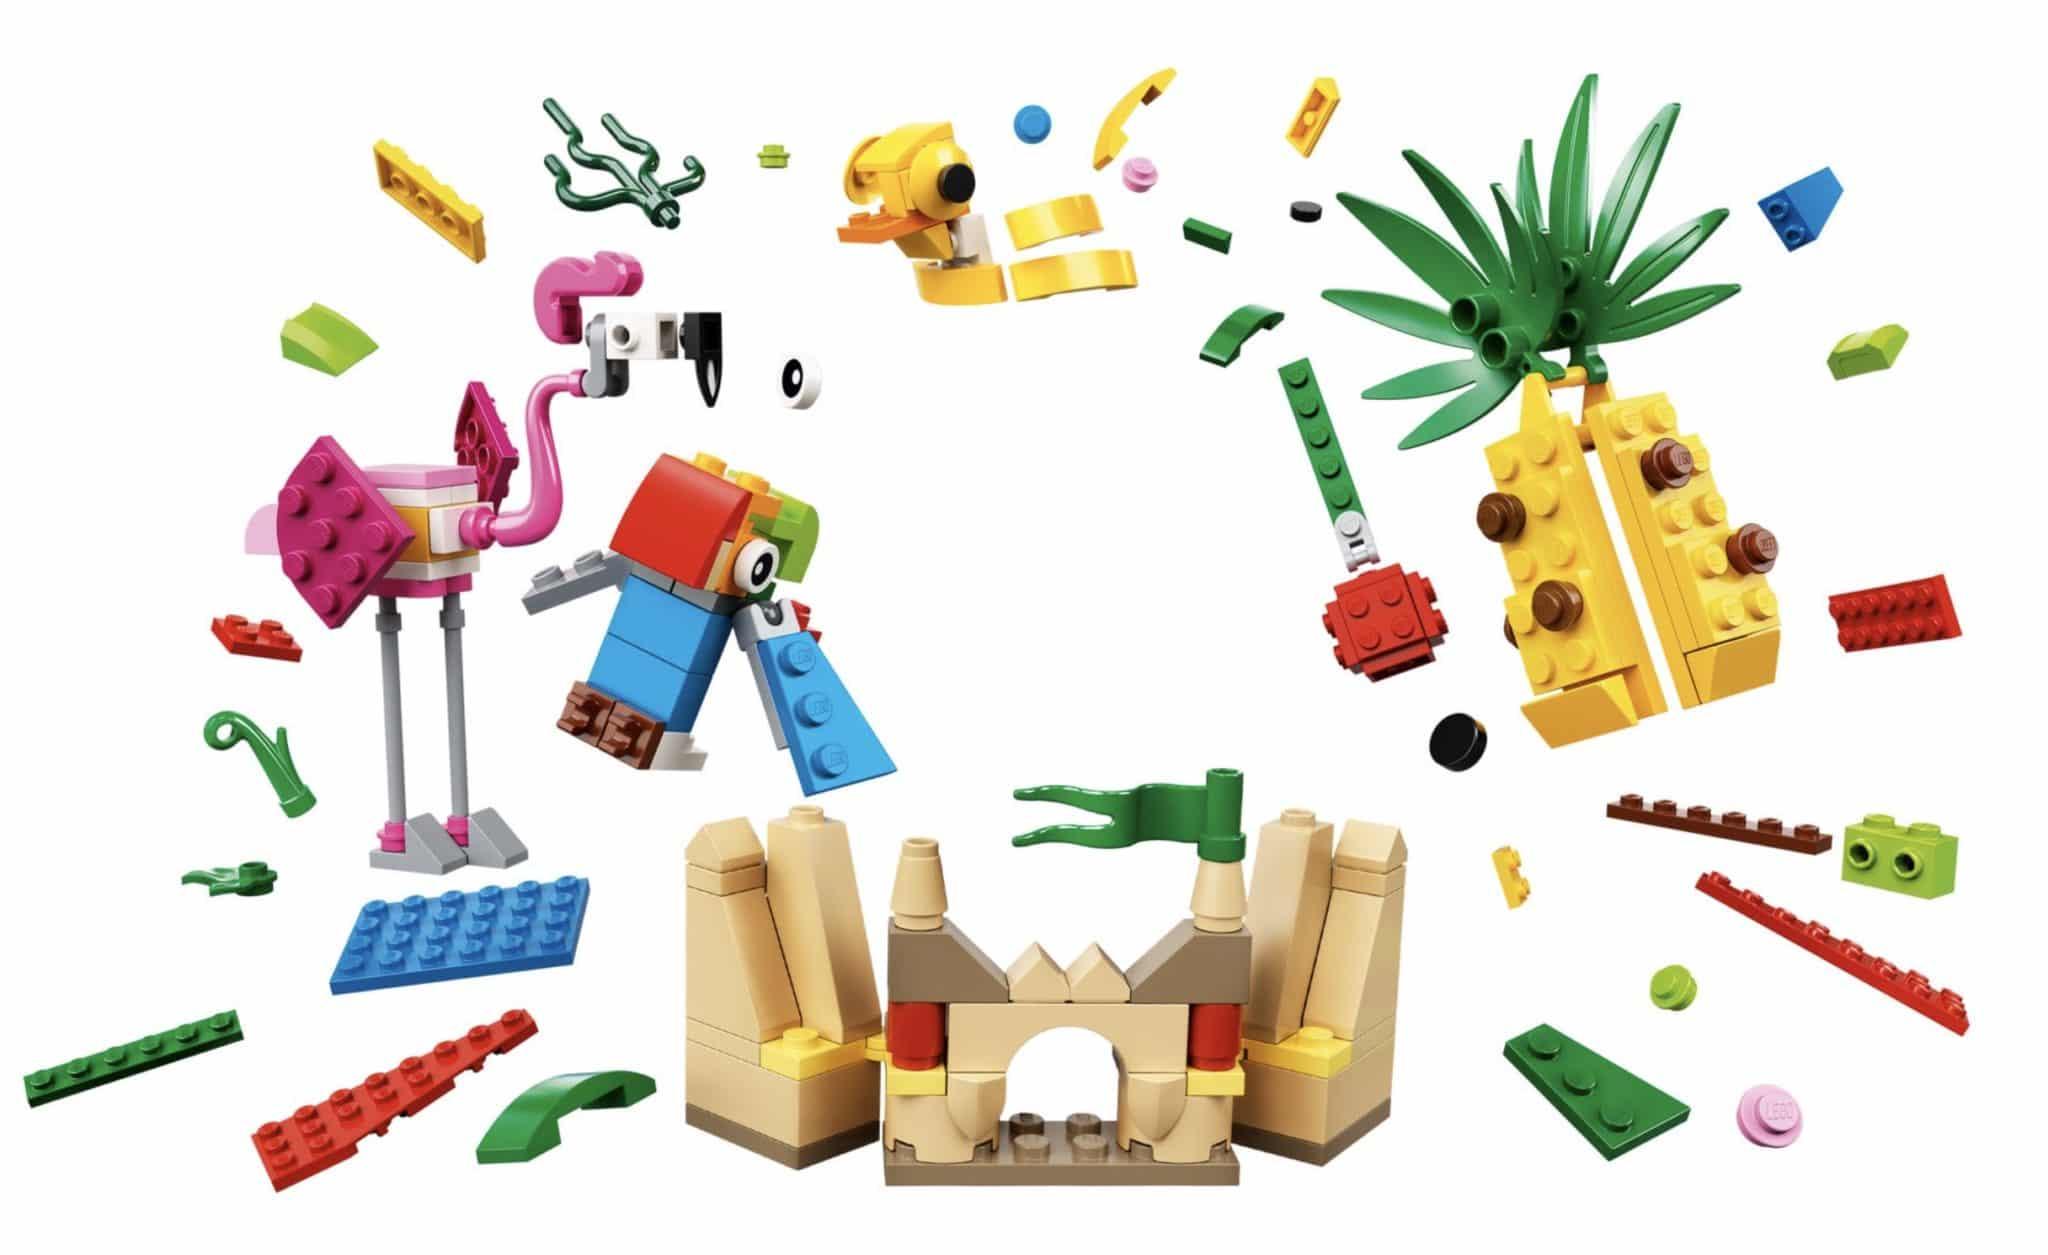 LEGO 40411 12 In 1 Summer Fun 8